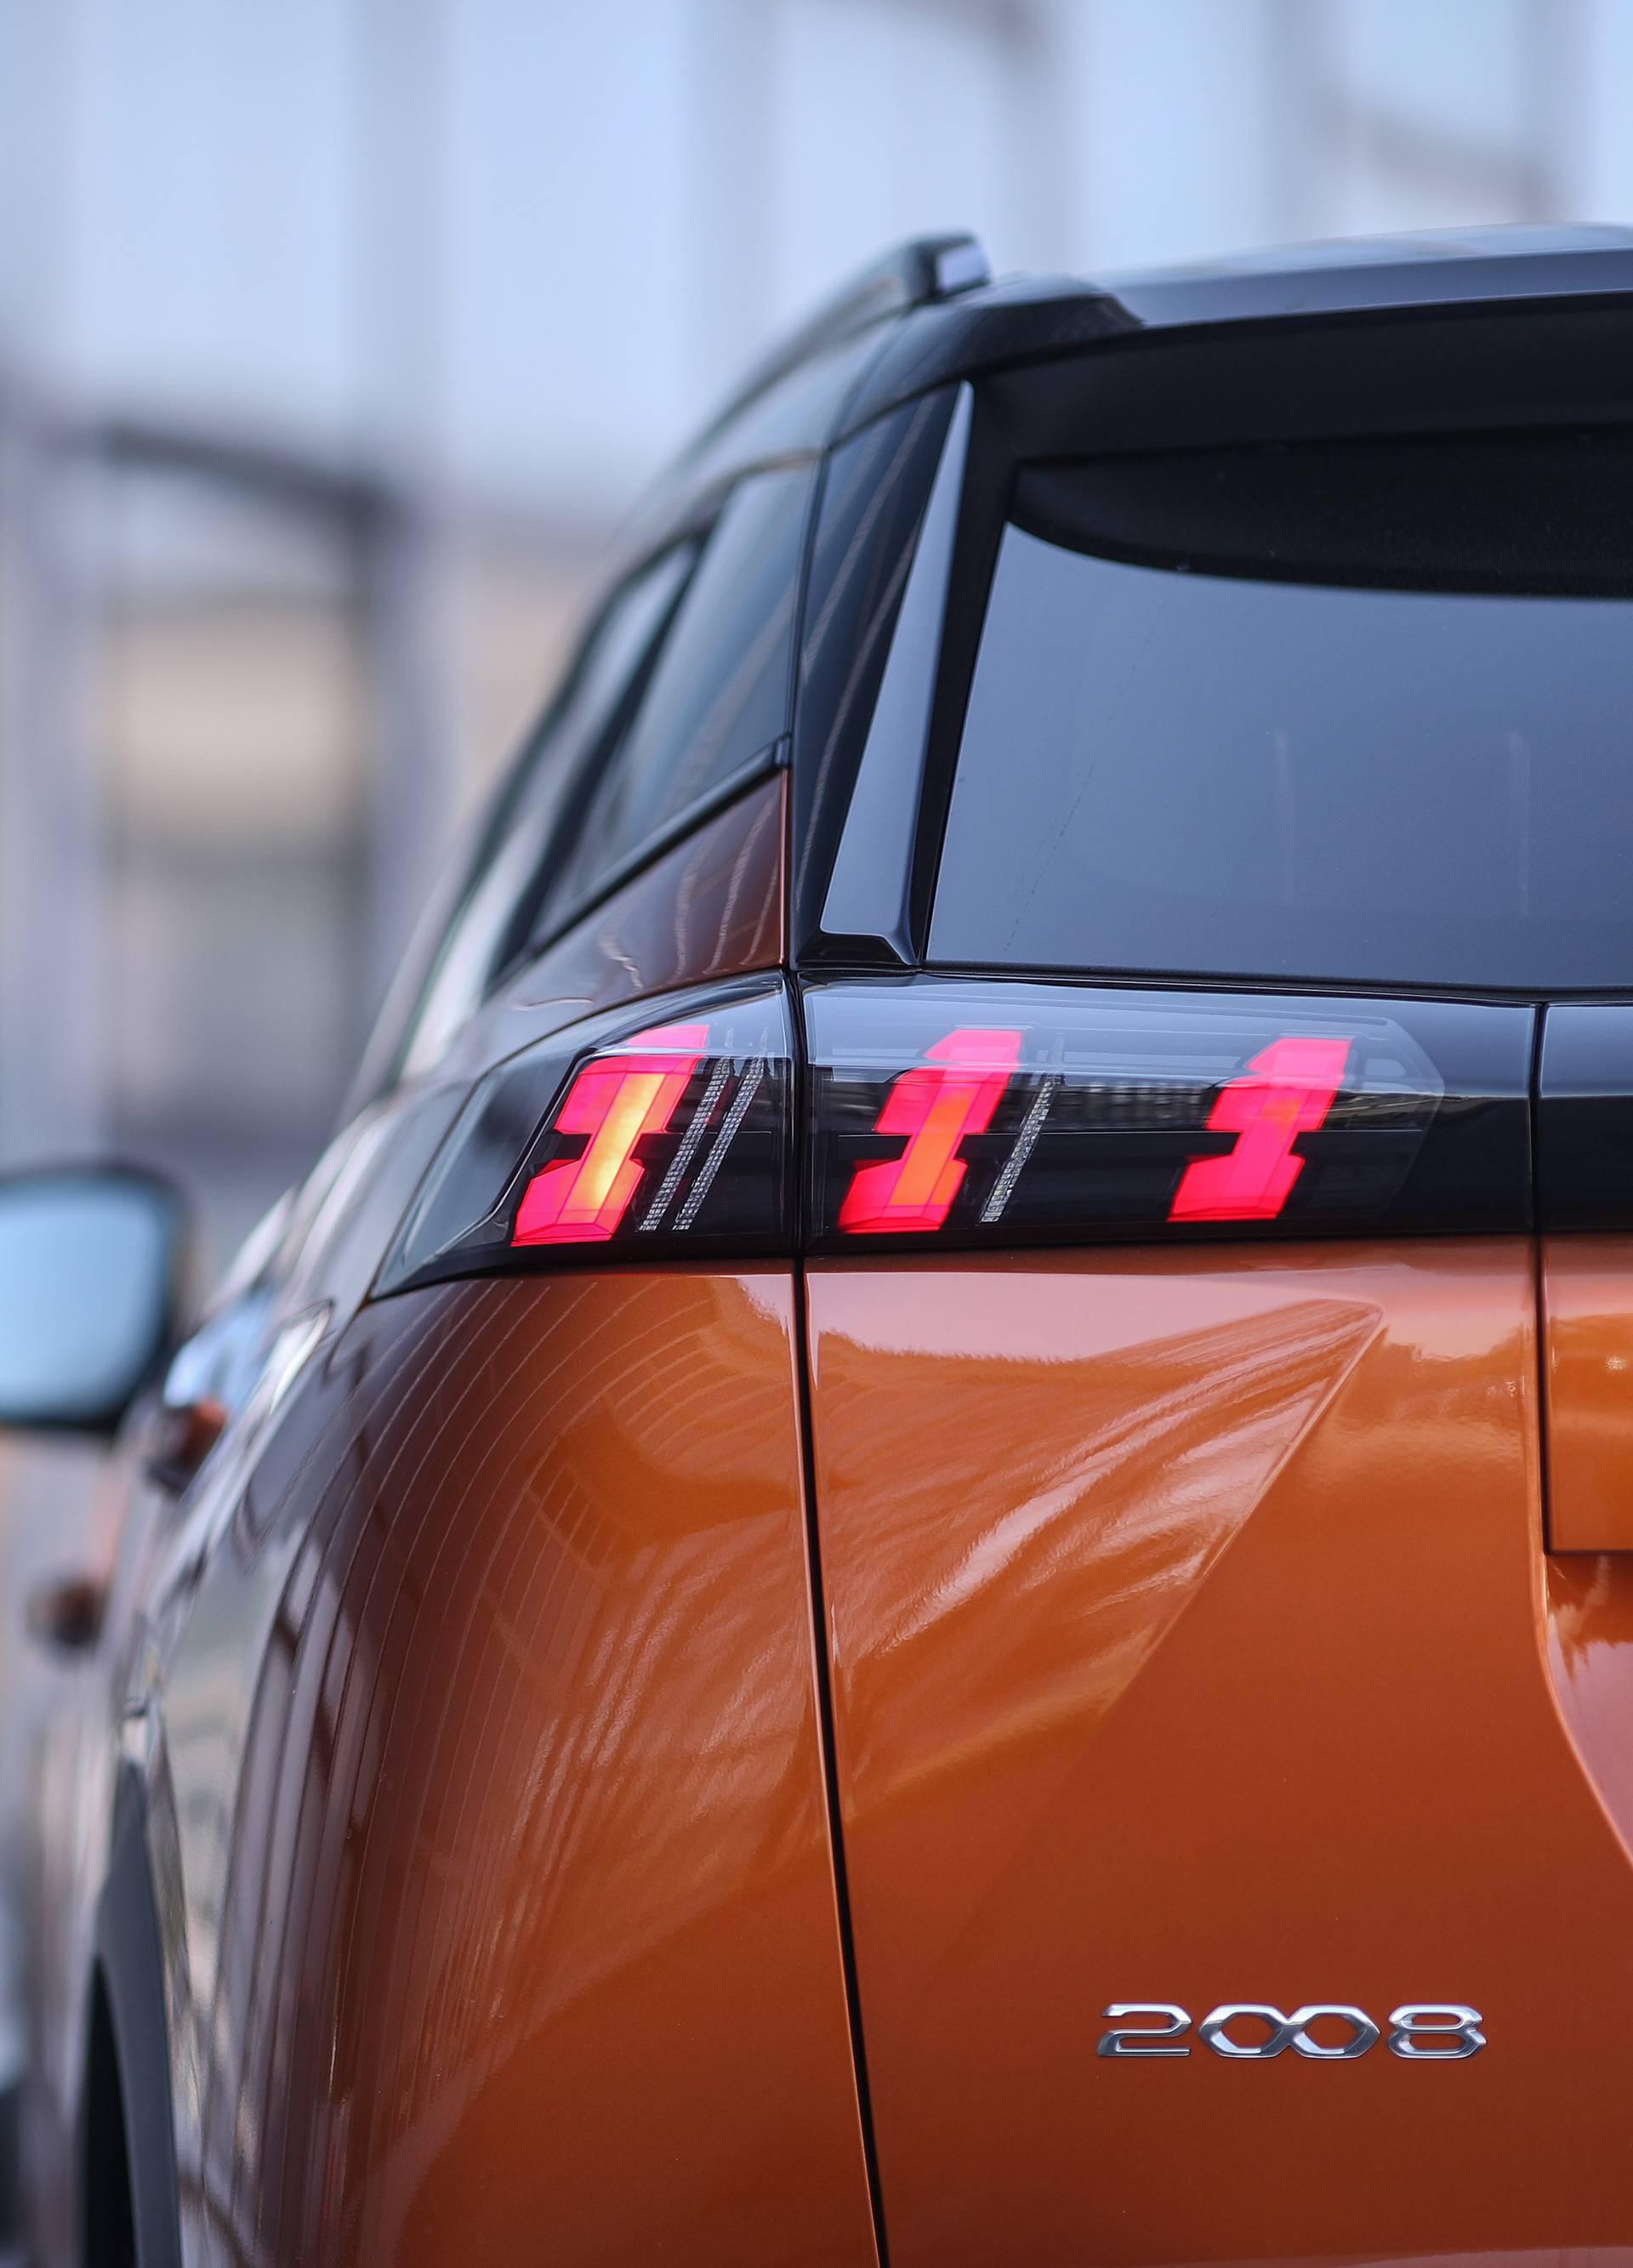 Mali veliki šarmer pun opreme: Testirali smo Peugeot 2008